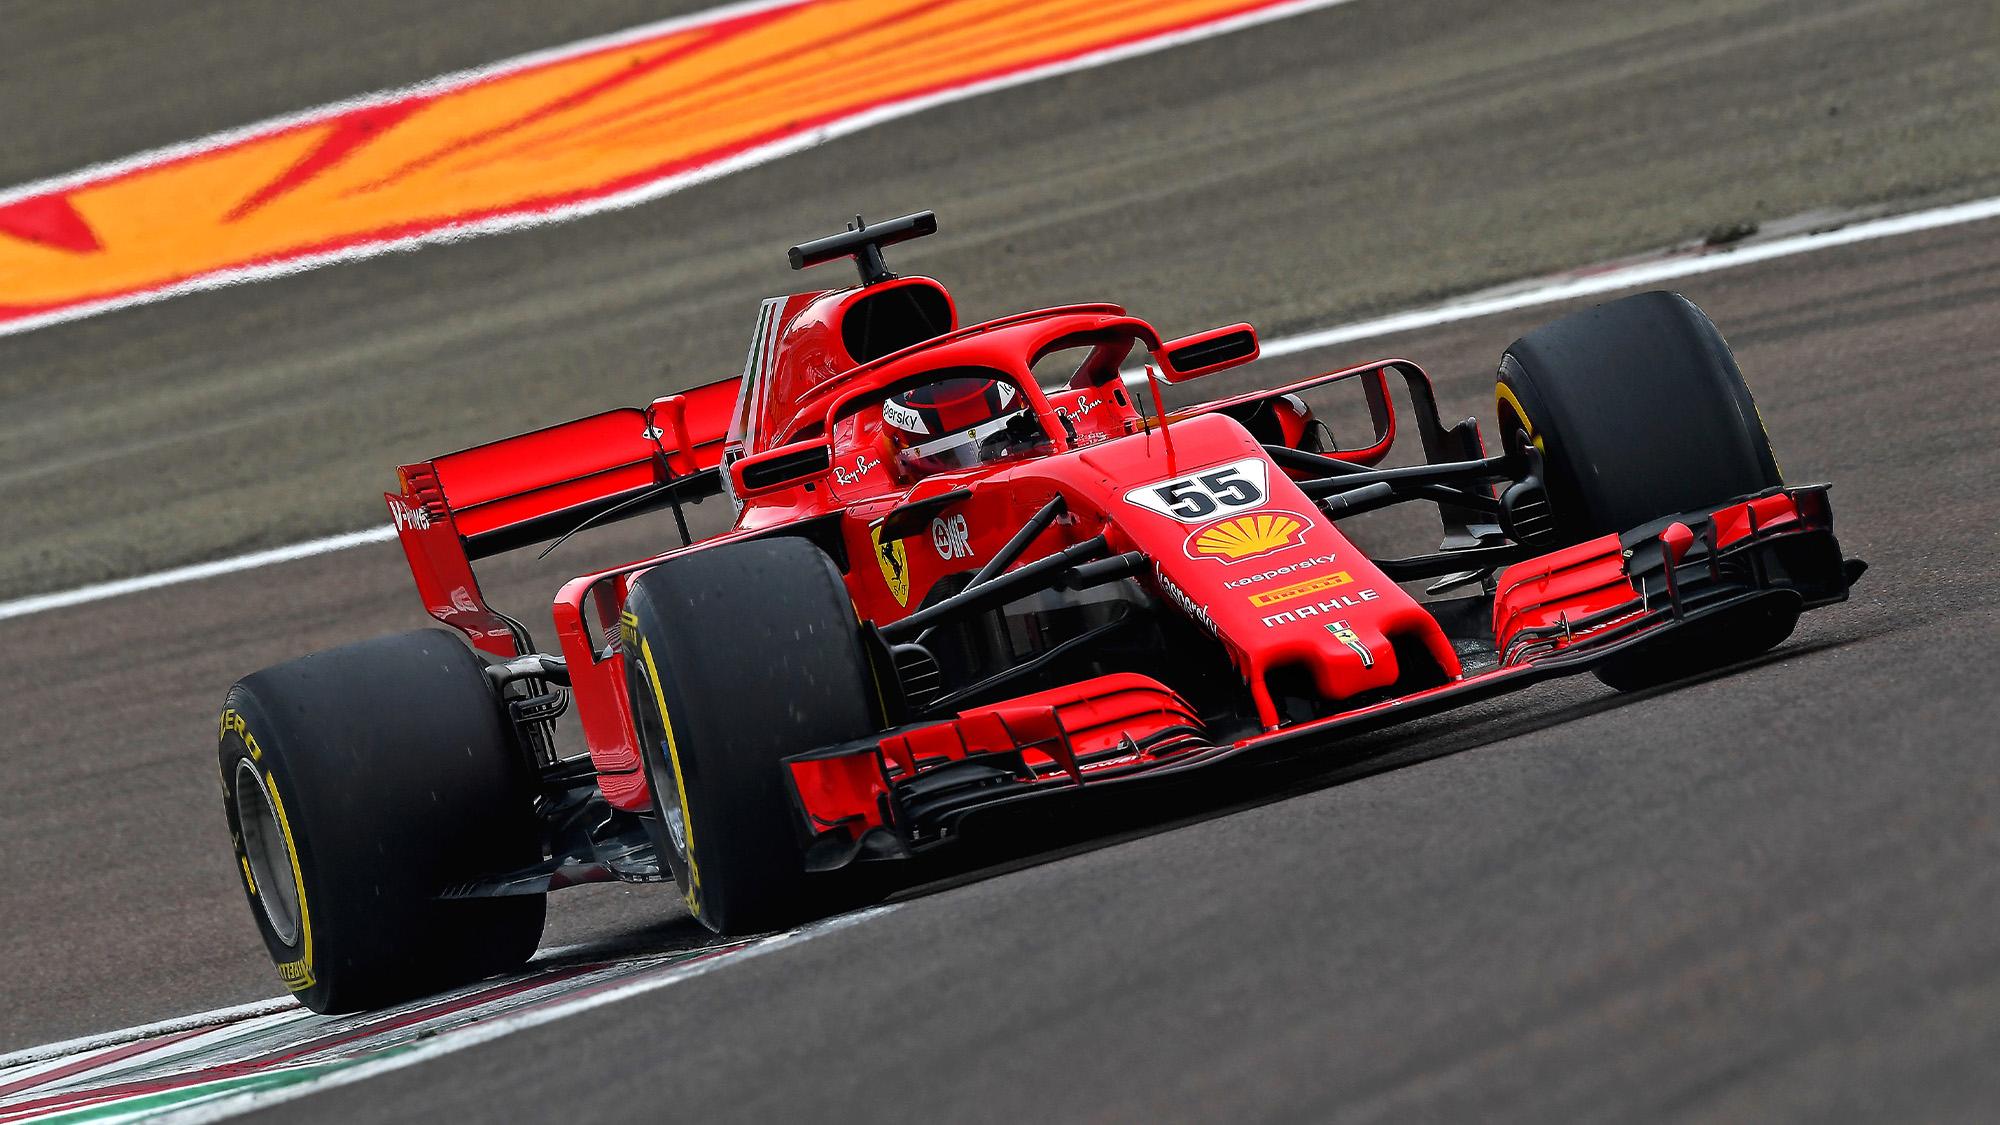 Carlos Sainz 2021 Fiorano Ferrari test in corner